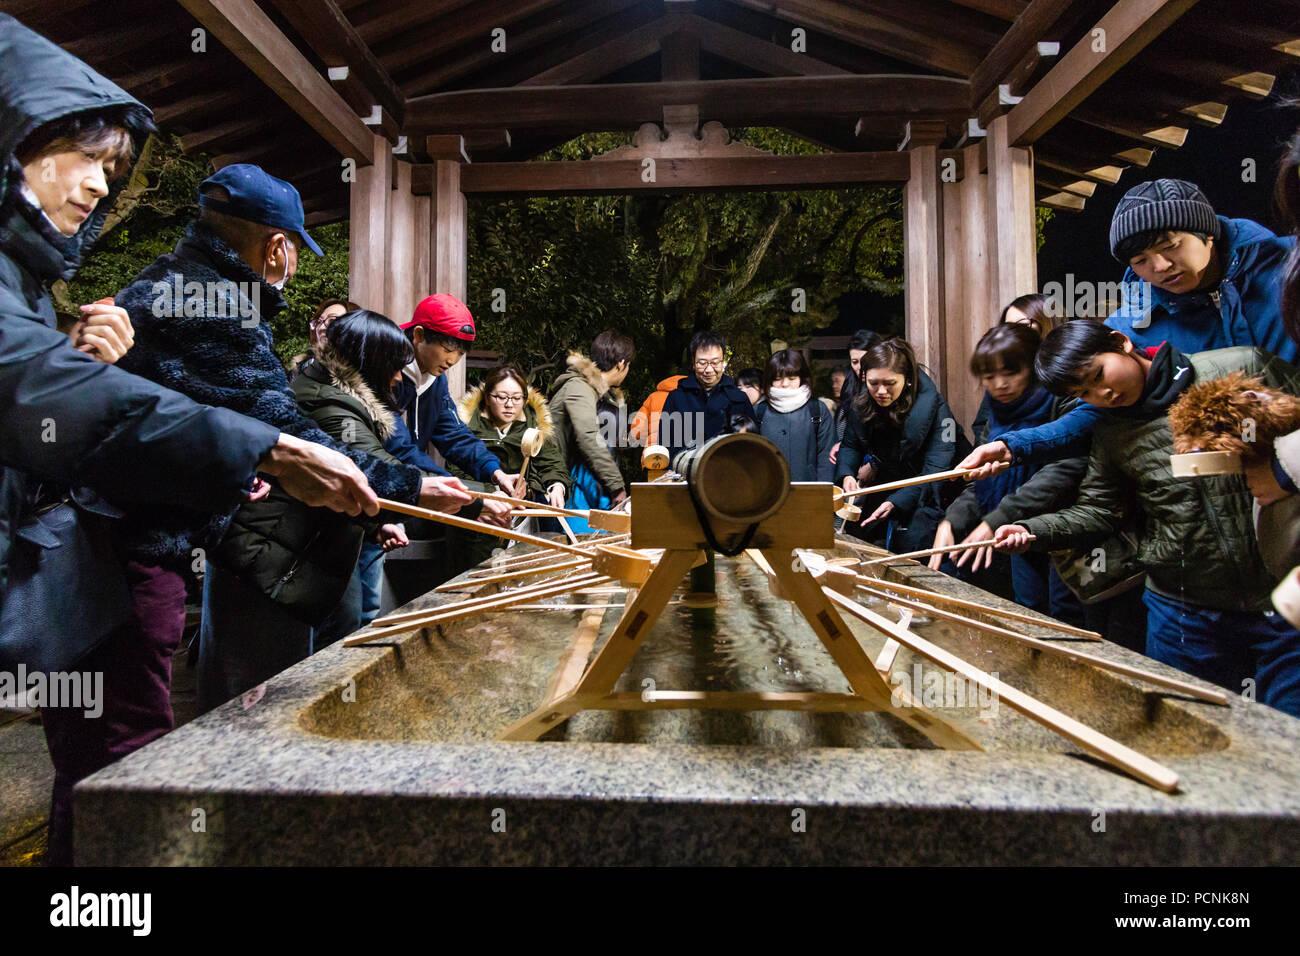 Shogatsu, New Year, Nishinomiya Shinto shrine, Japan. Purification basin, chozuya, packed at midnight with people arriving for Hatsumode, first visit. - Stock Image